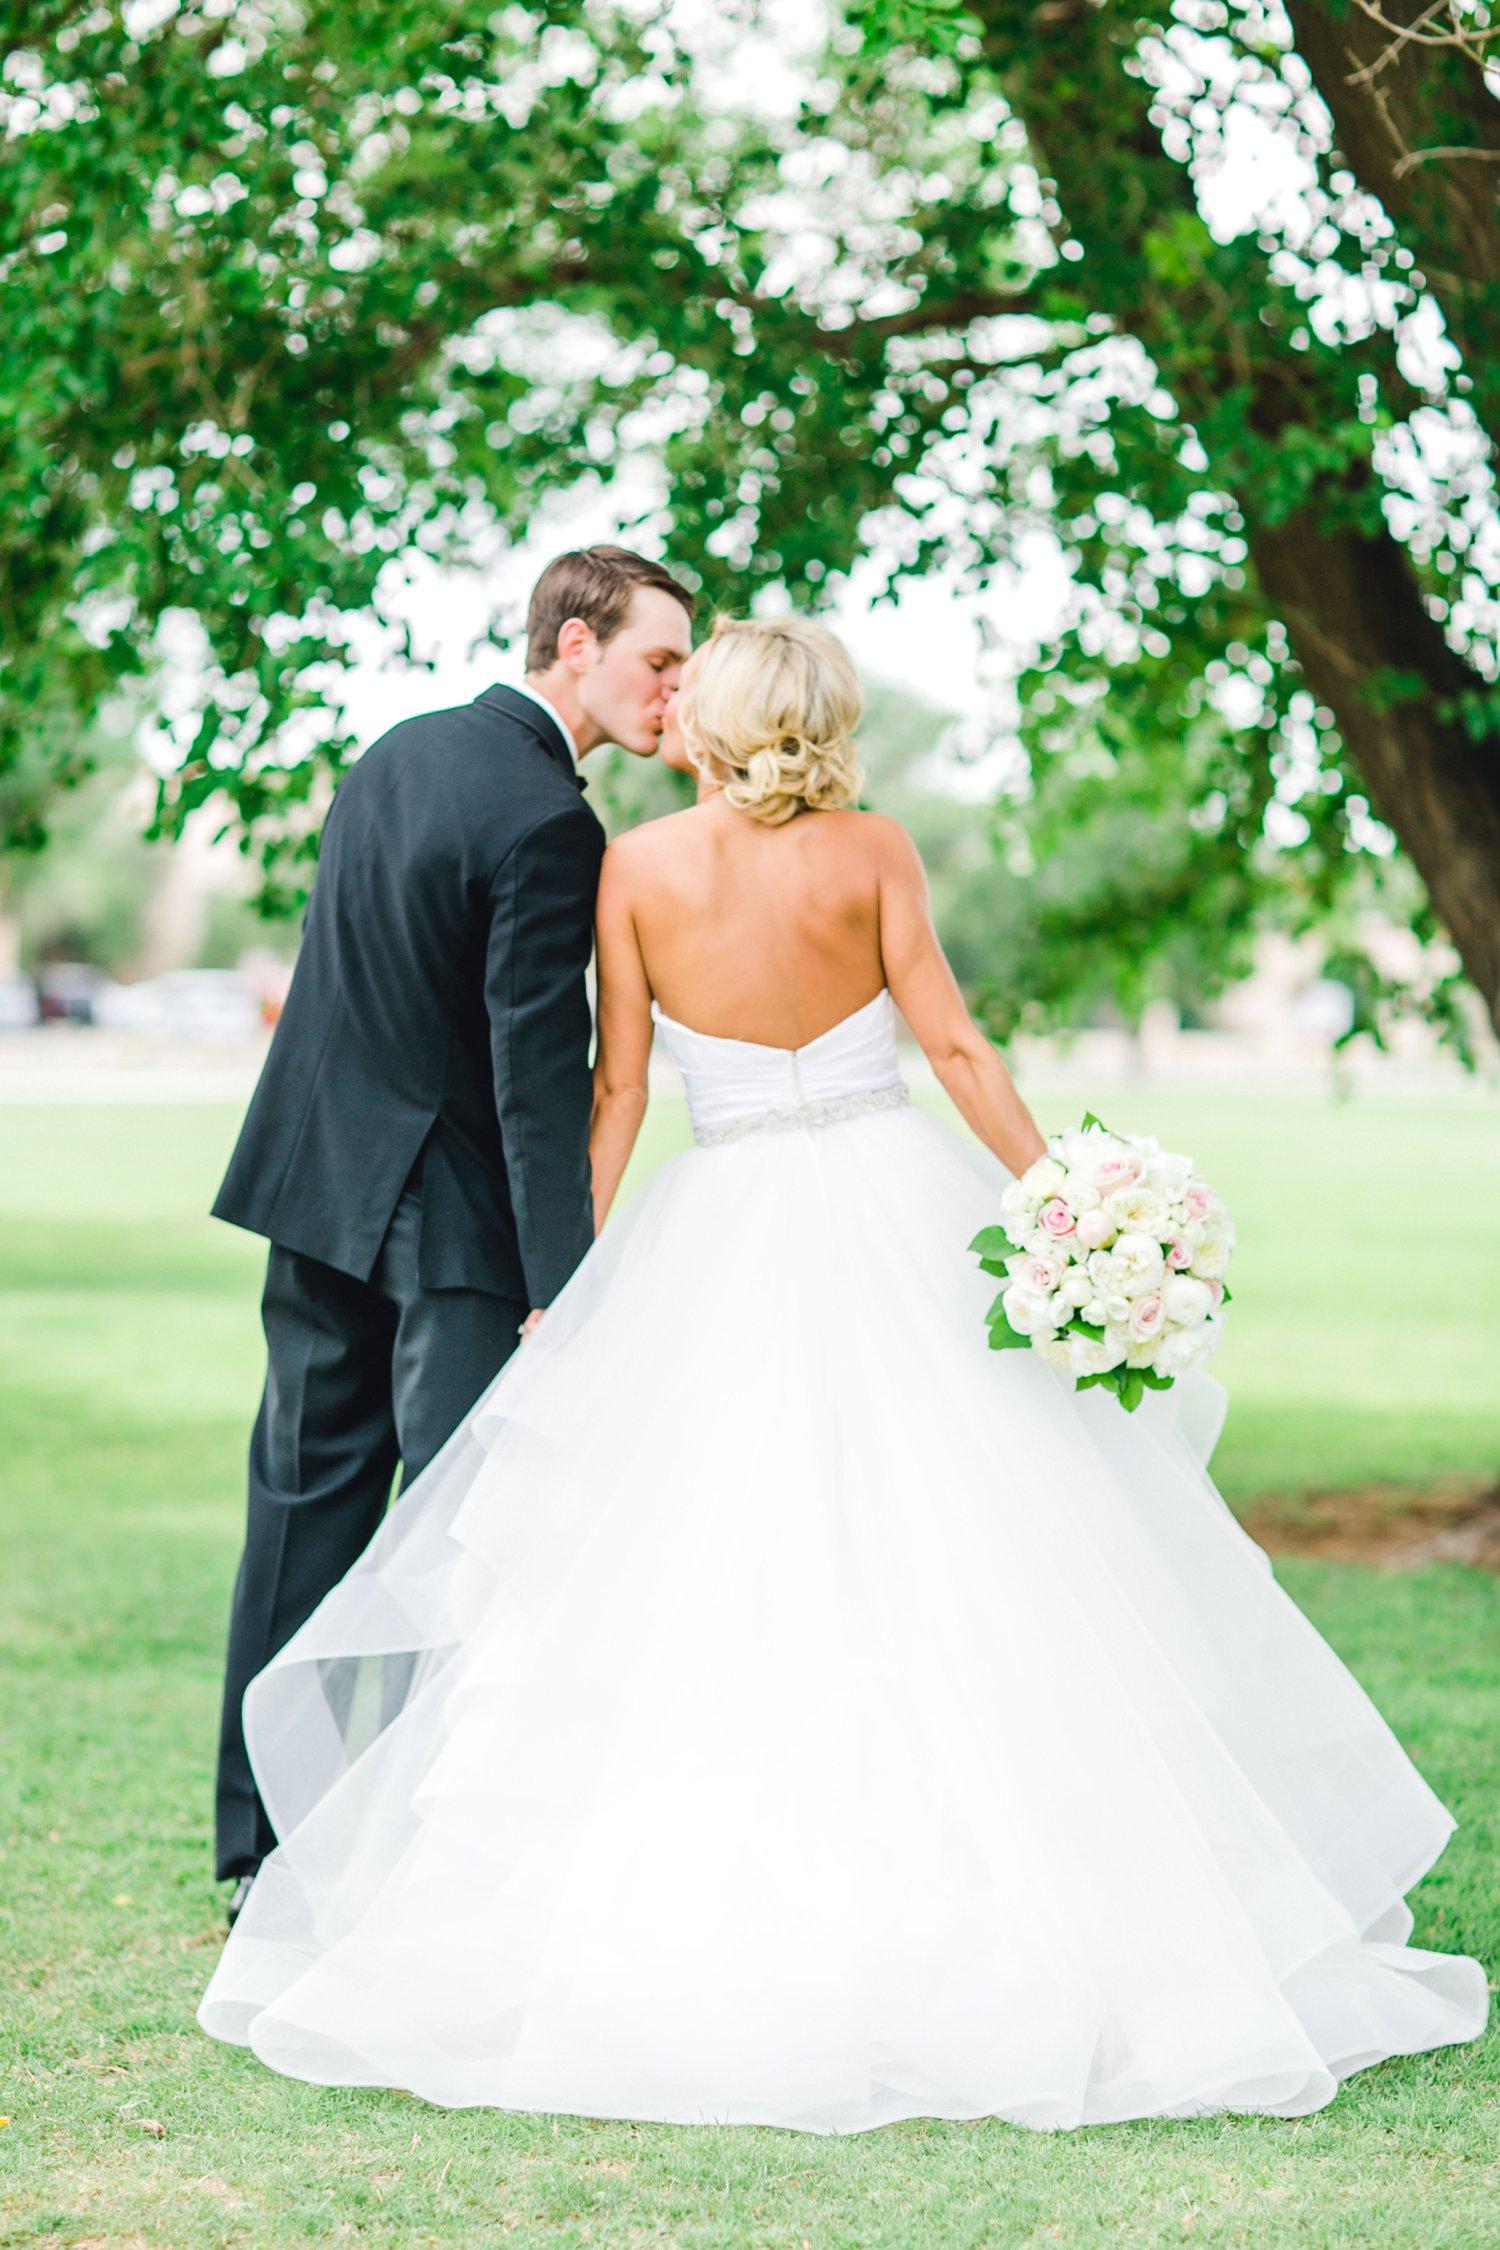 Taylor-and-Brock-Williams-Texas-Tech-University-Merket-Alumni-Center-Lubbock-Photographer-ALLEEJ0054.jpg